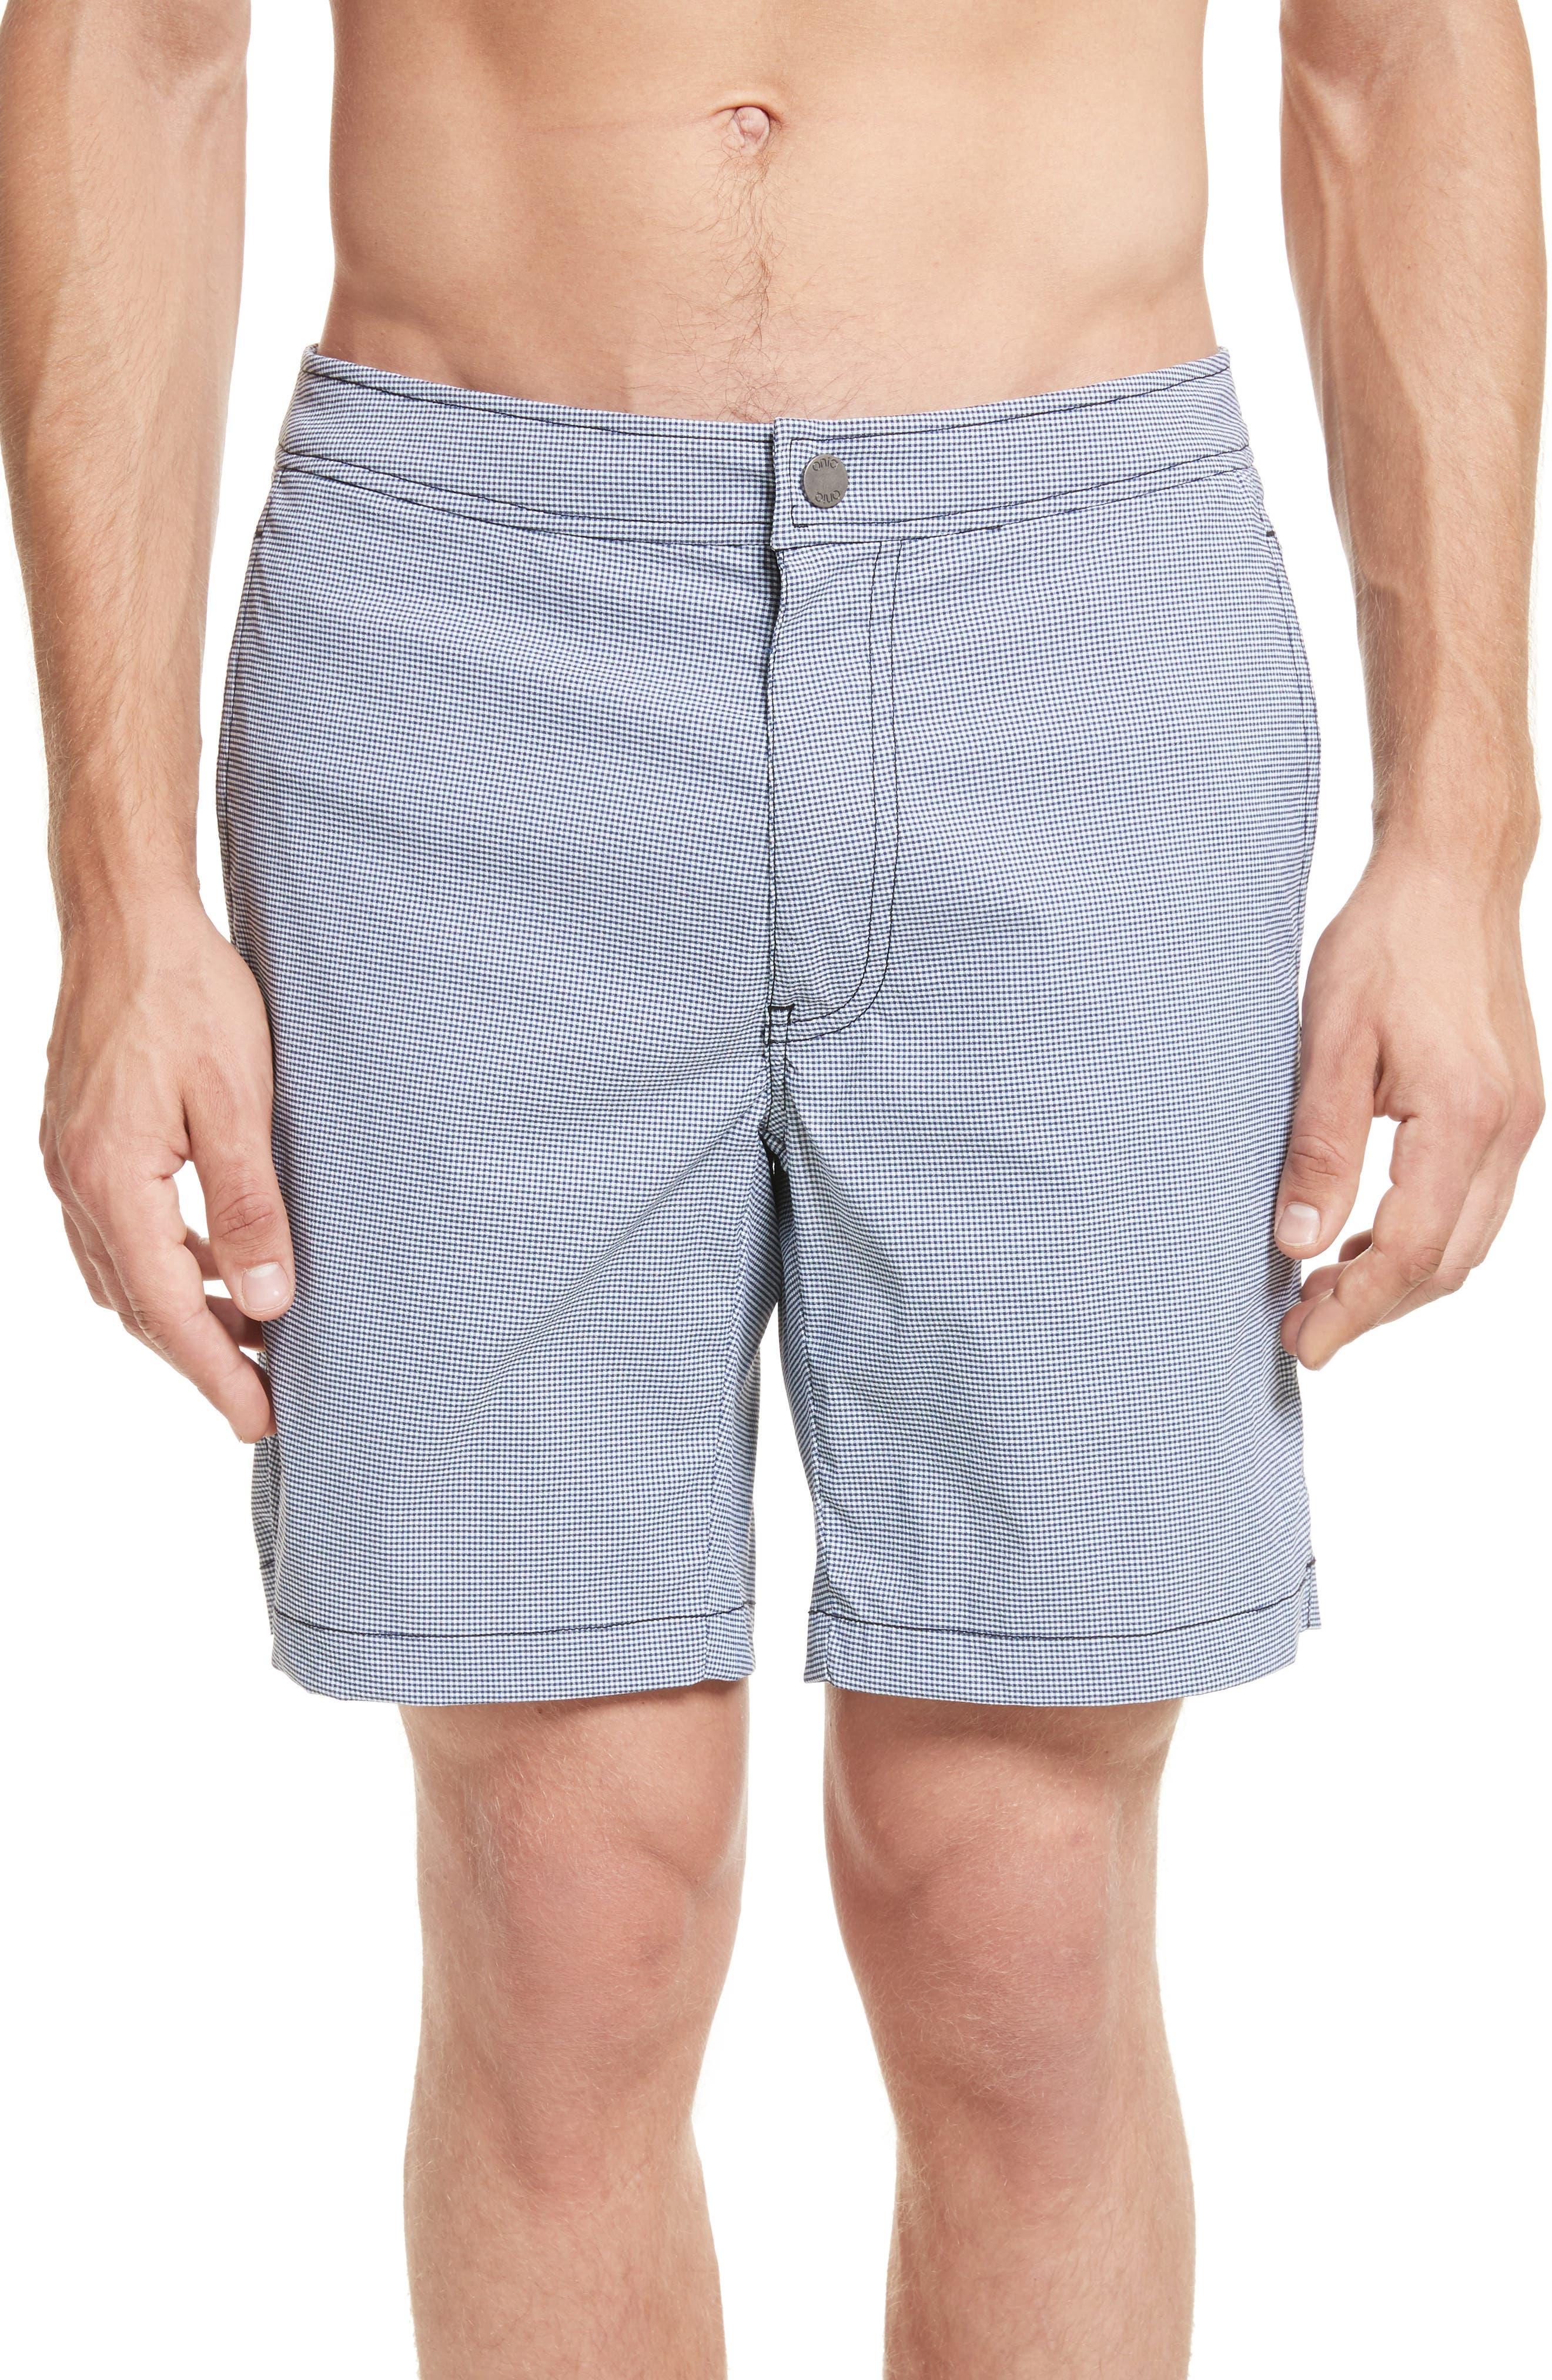 Calder Gingham Board Shorts,                         Main,                         color, DEEP NAVY/WHITE